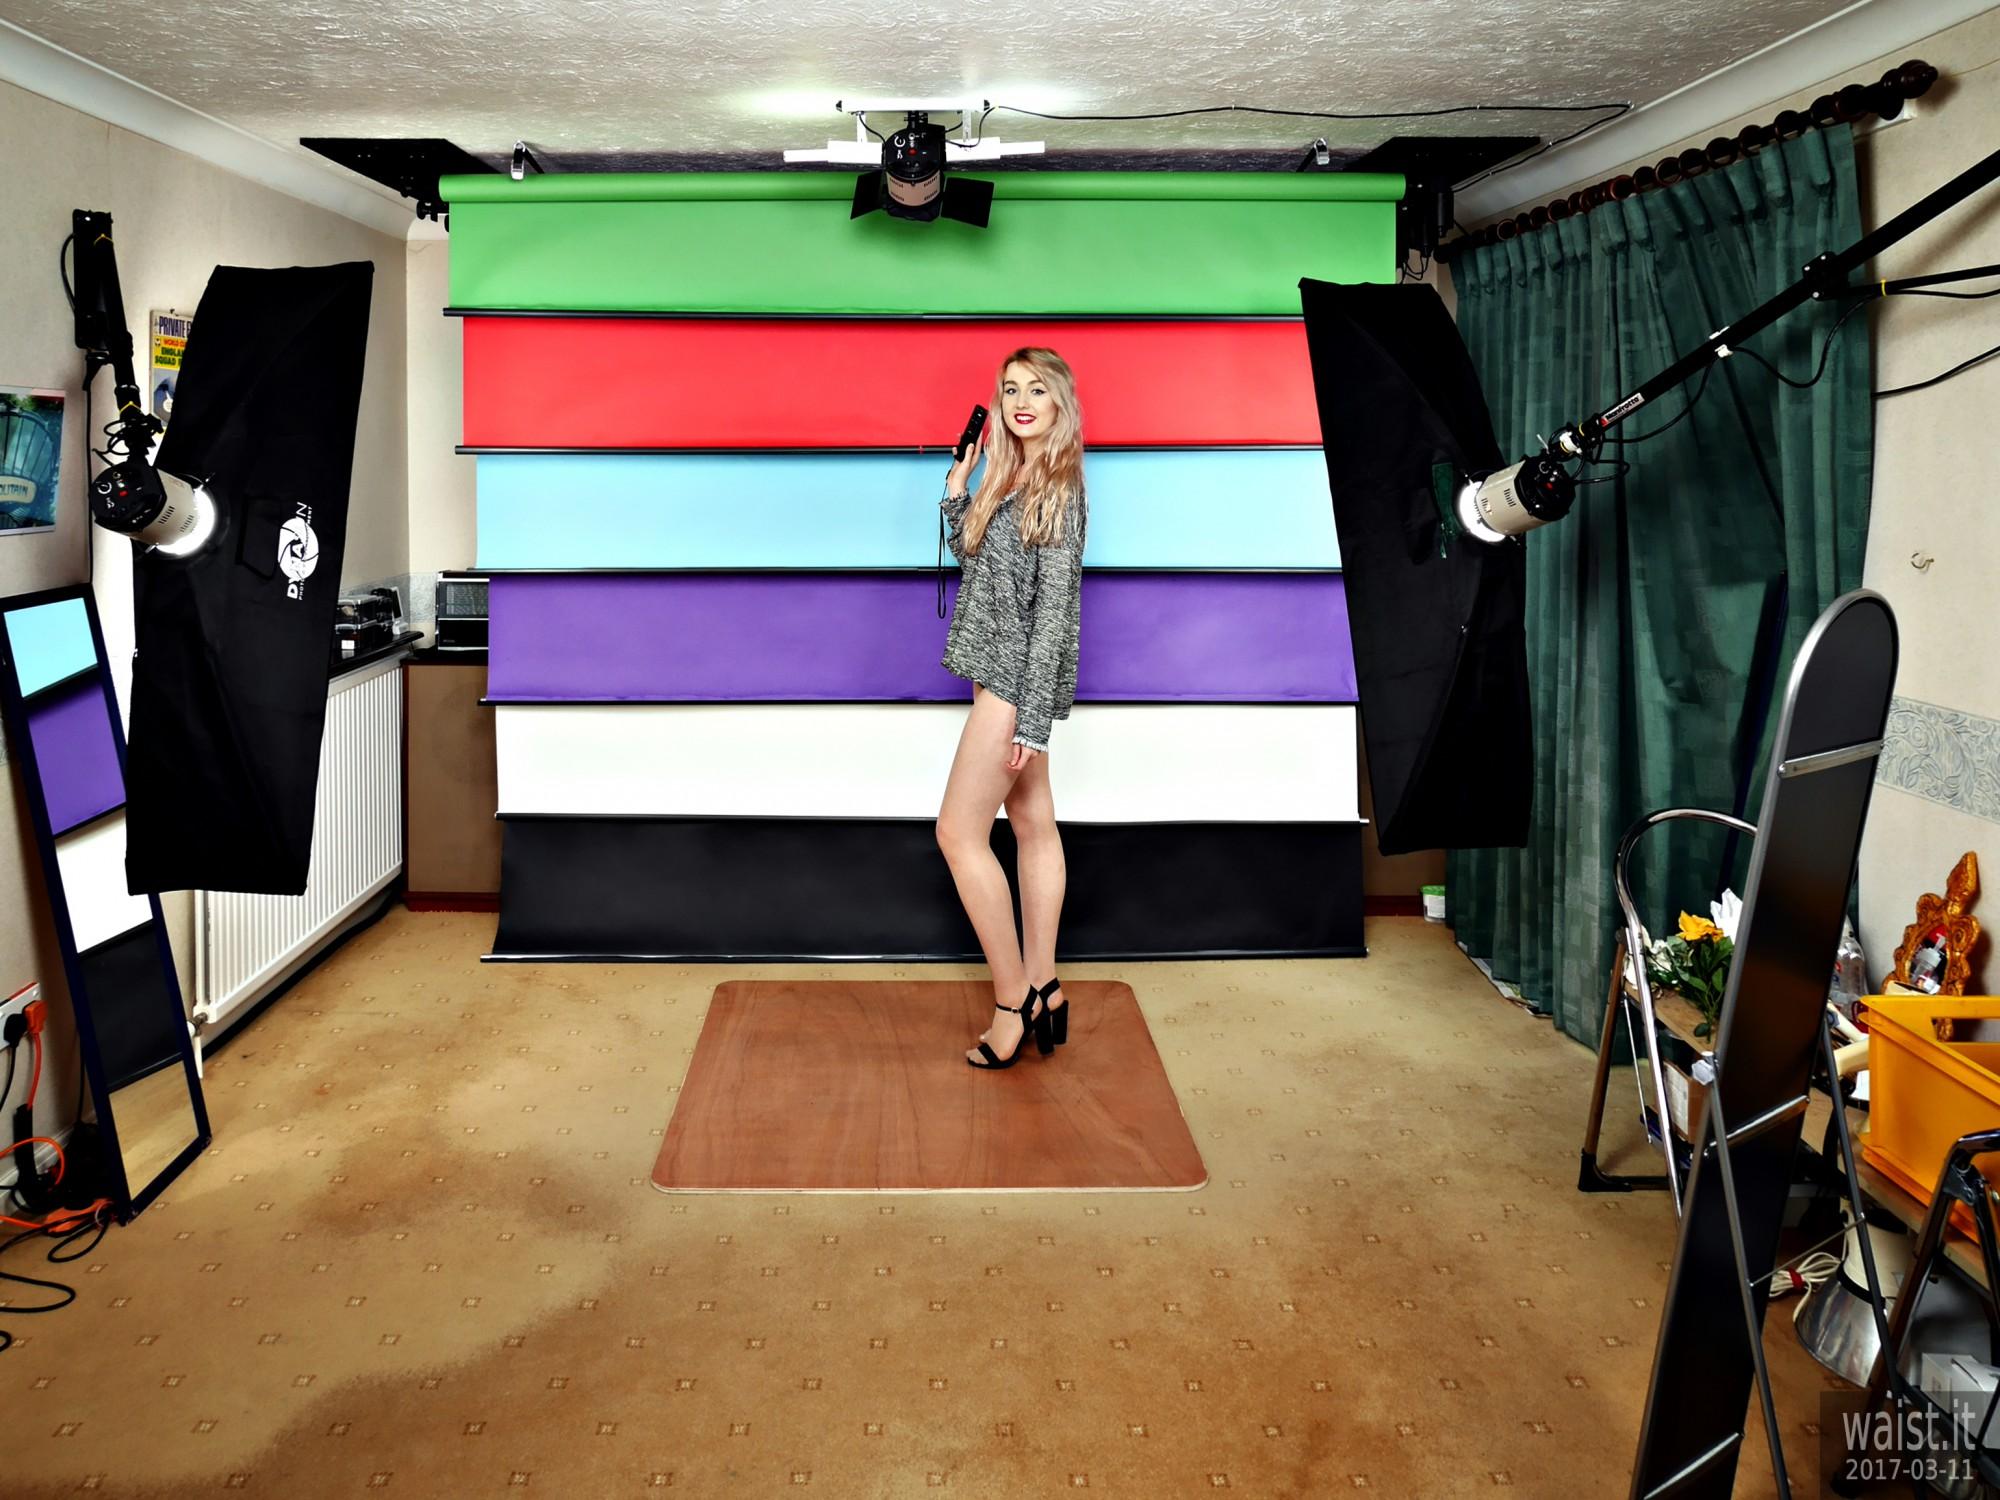 2017-03-11 LilyAmber demonstrates the studio's 6-roll, radio-controlled, motorised backdrop system, studio long shot